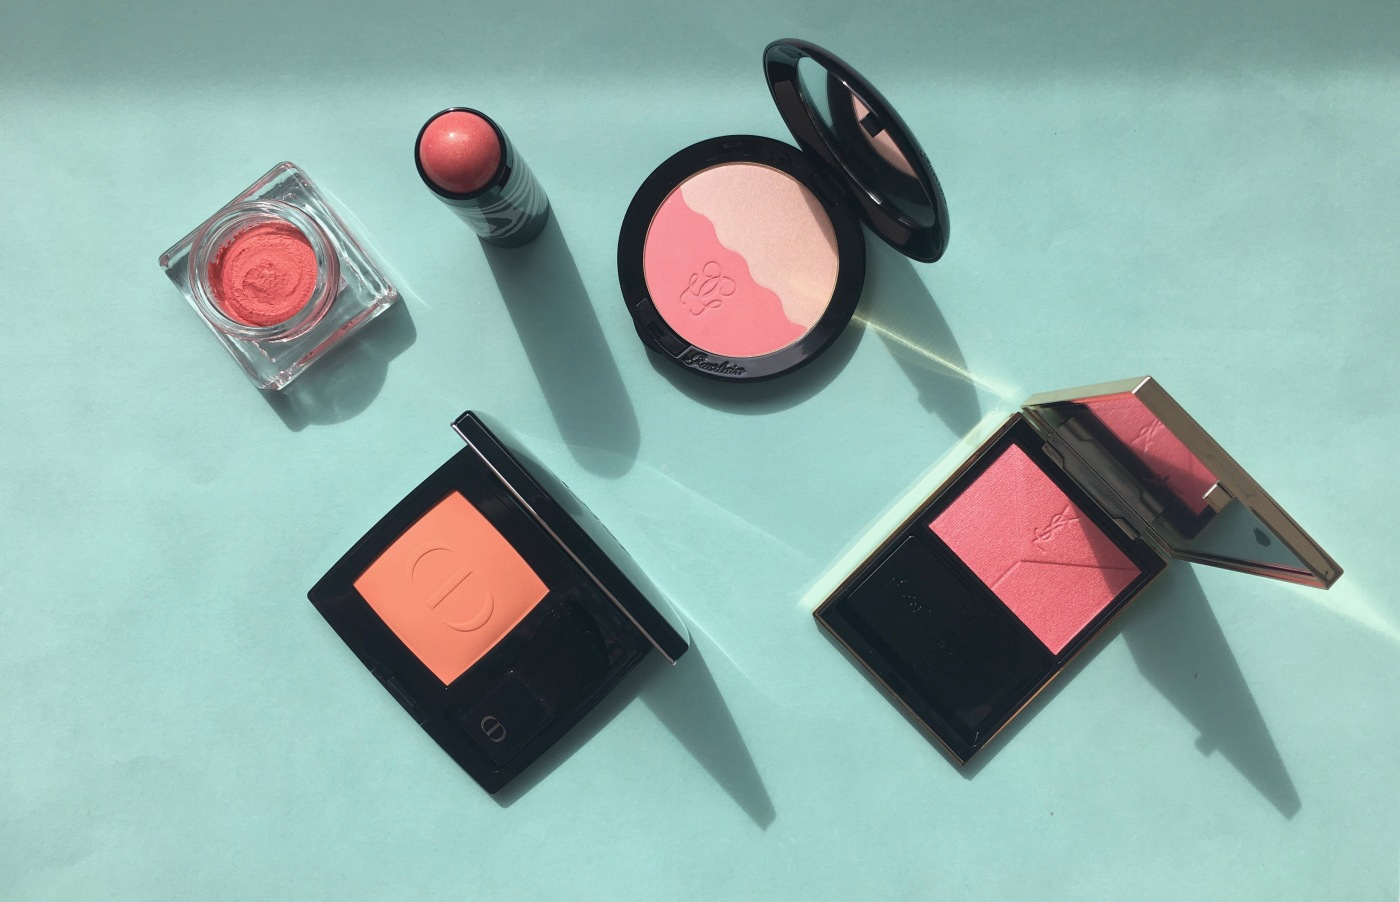 blush aw2018 phyto blush twist sisley christian dior rouge blush shiseido yves saint laurent beauté couture blush two tone blush guerlain